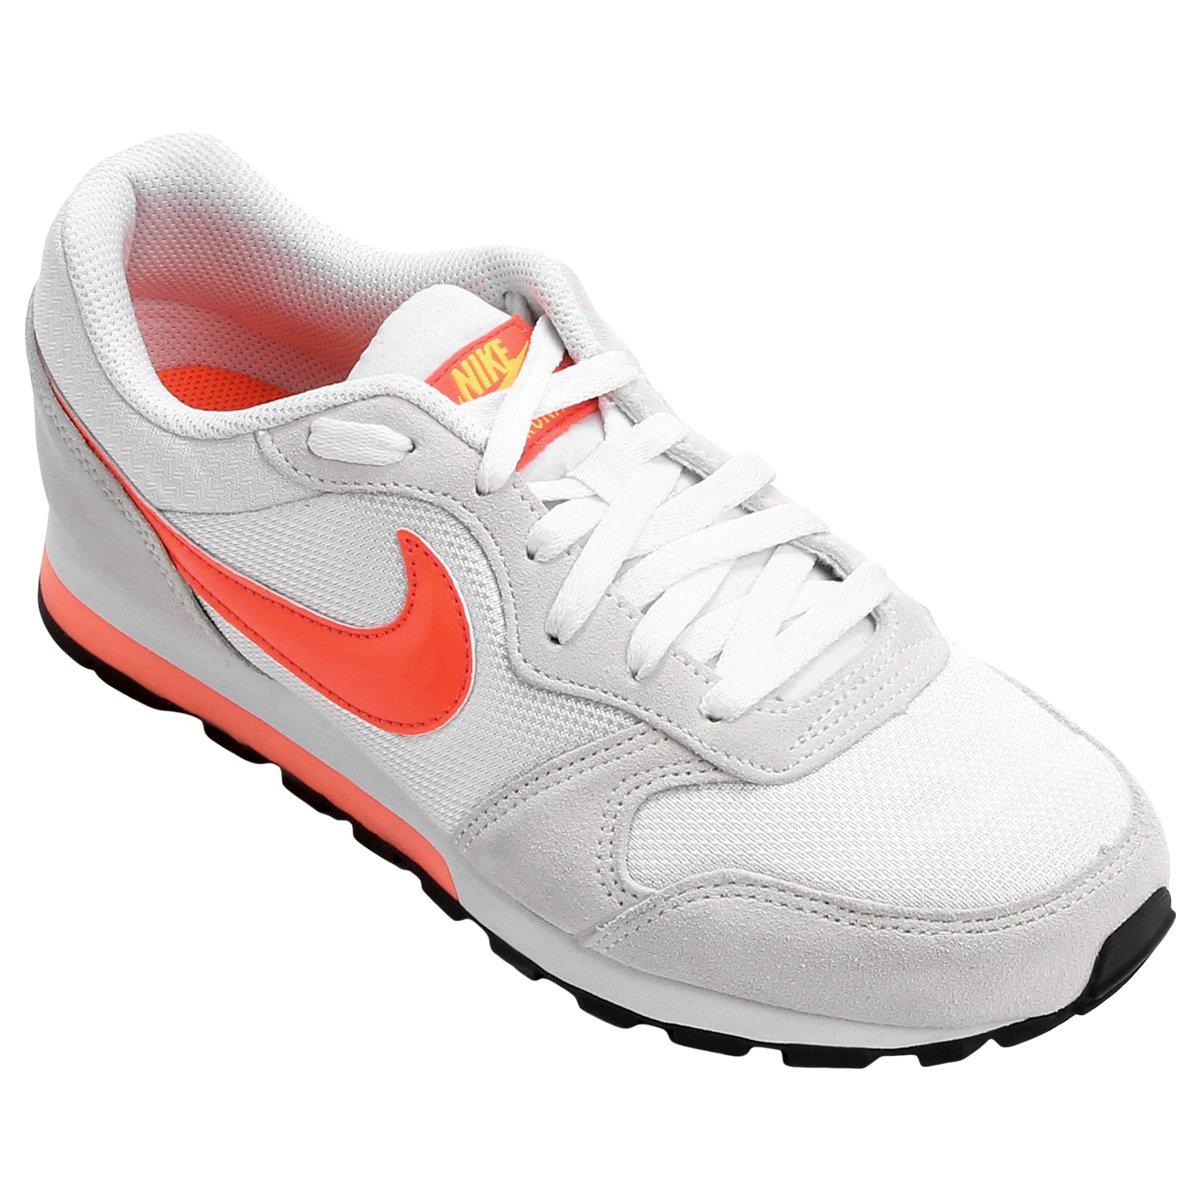 Tênis Nike Md Runner 2 Feminino - Branco e Laranja - Compre Agora ... 0a053a490edf4